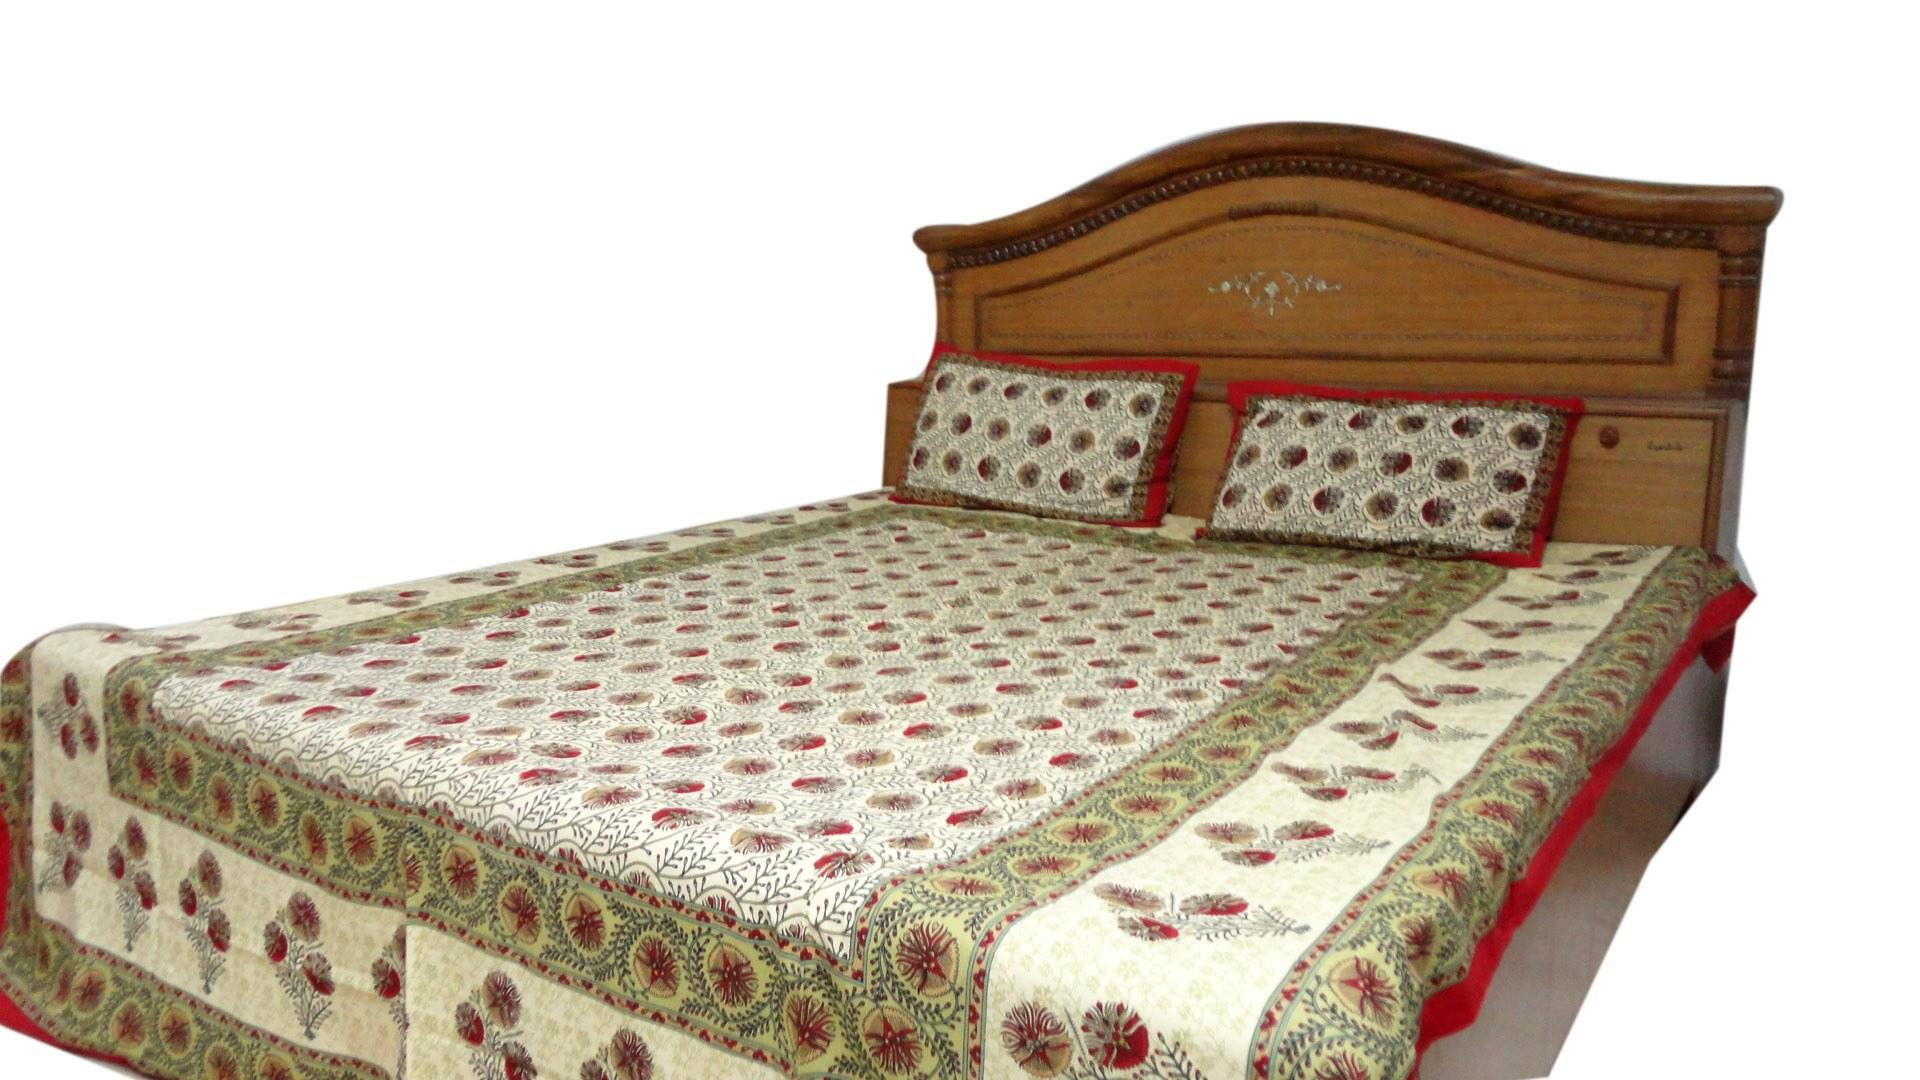 Bed sheet wallpaper for Wallpaper sheets